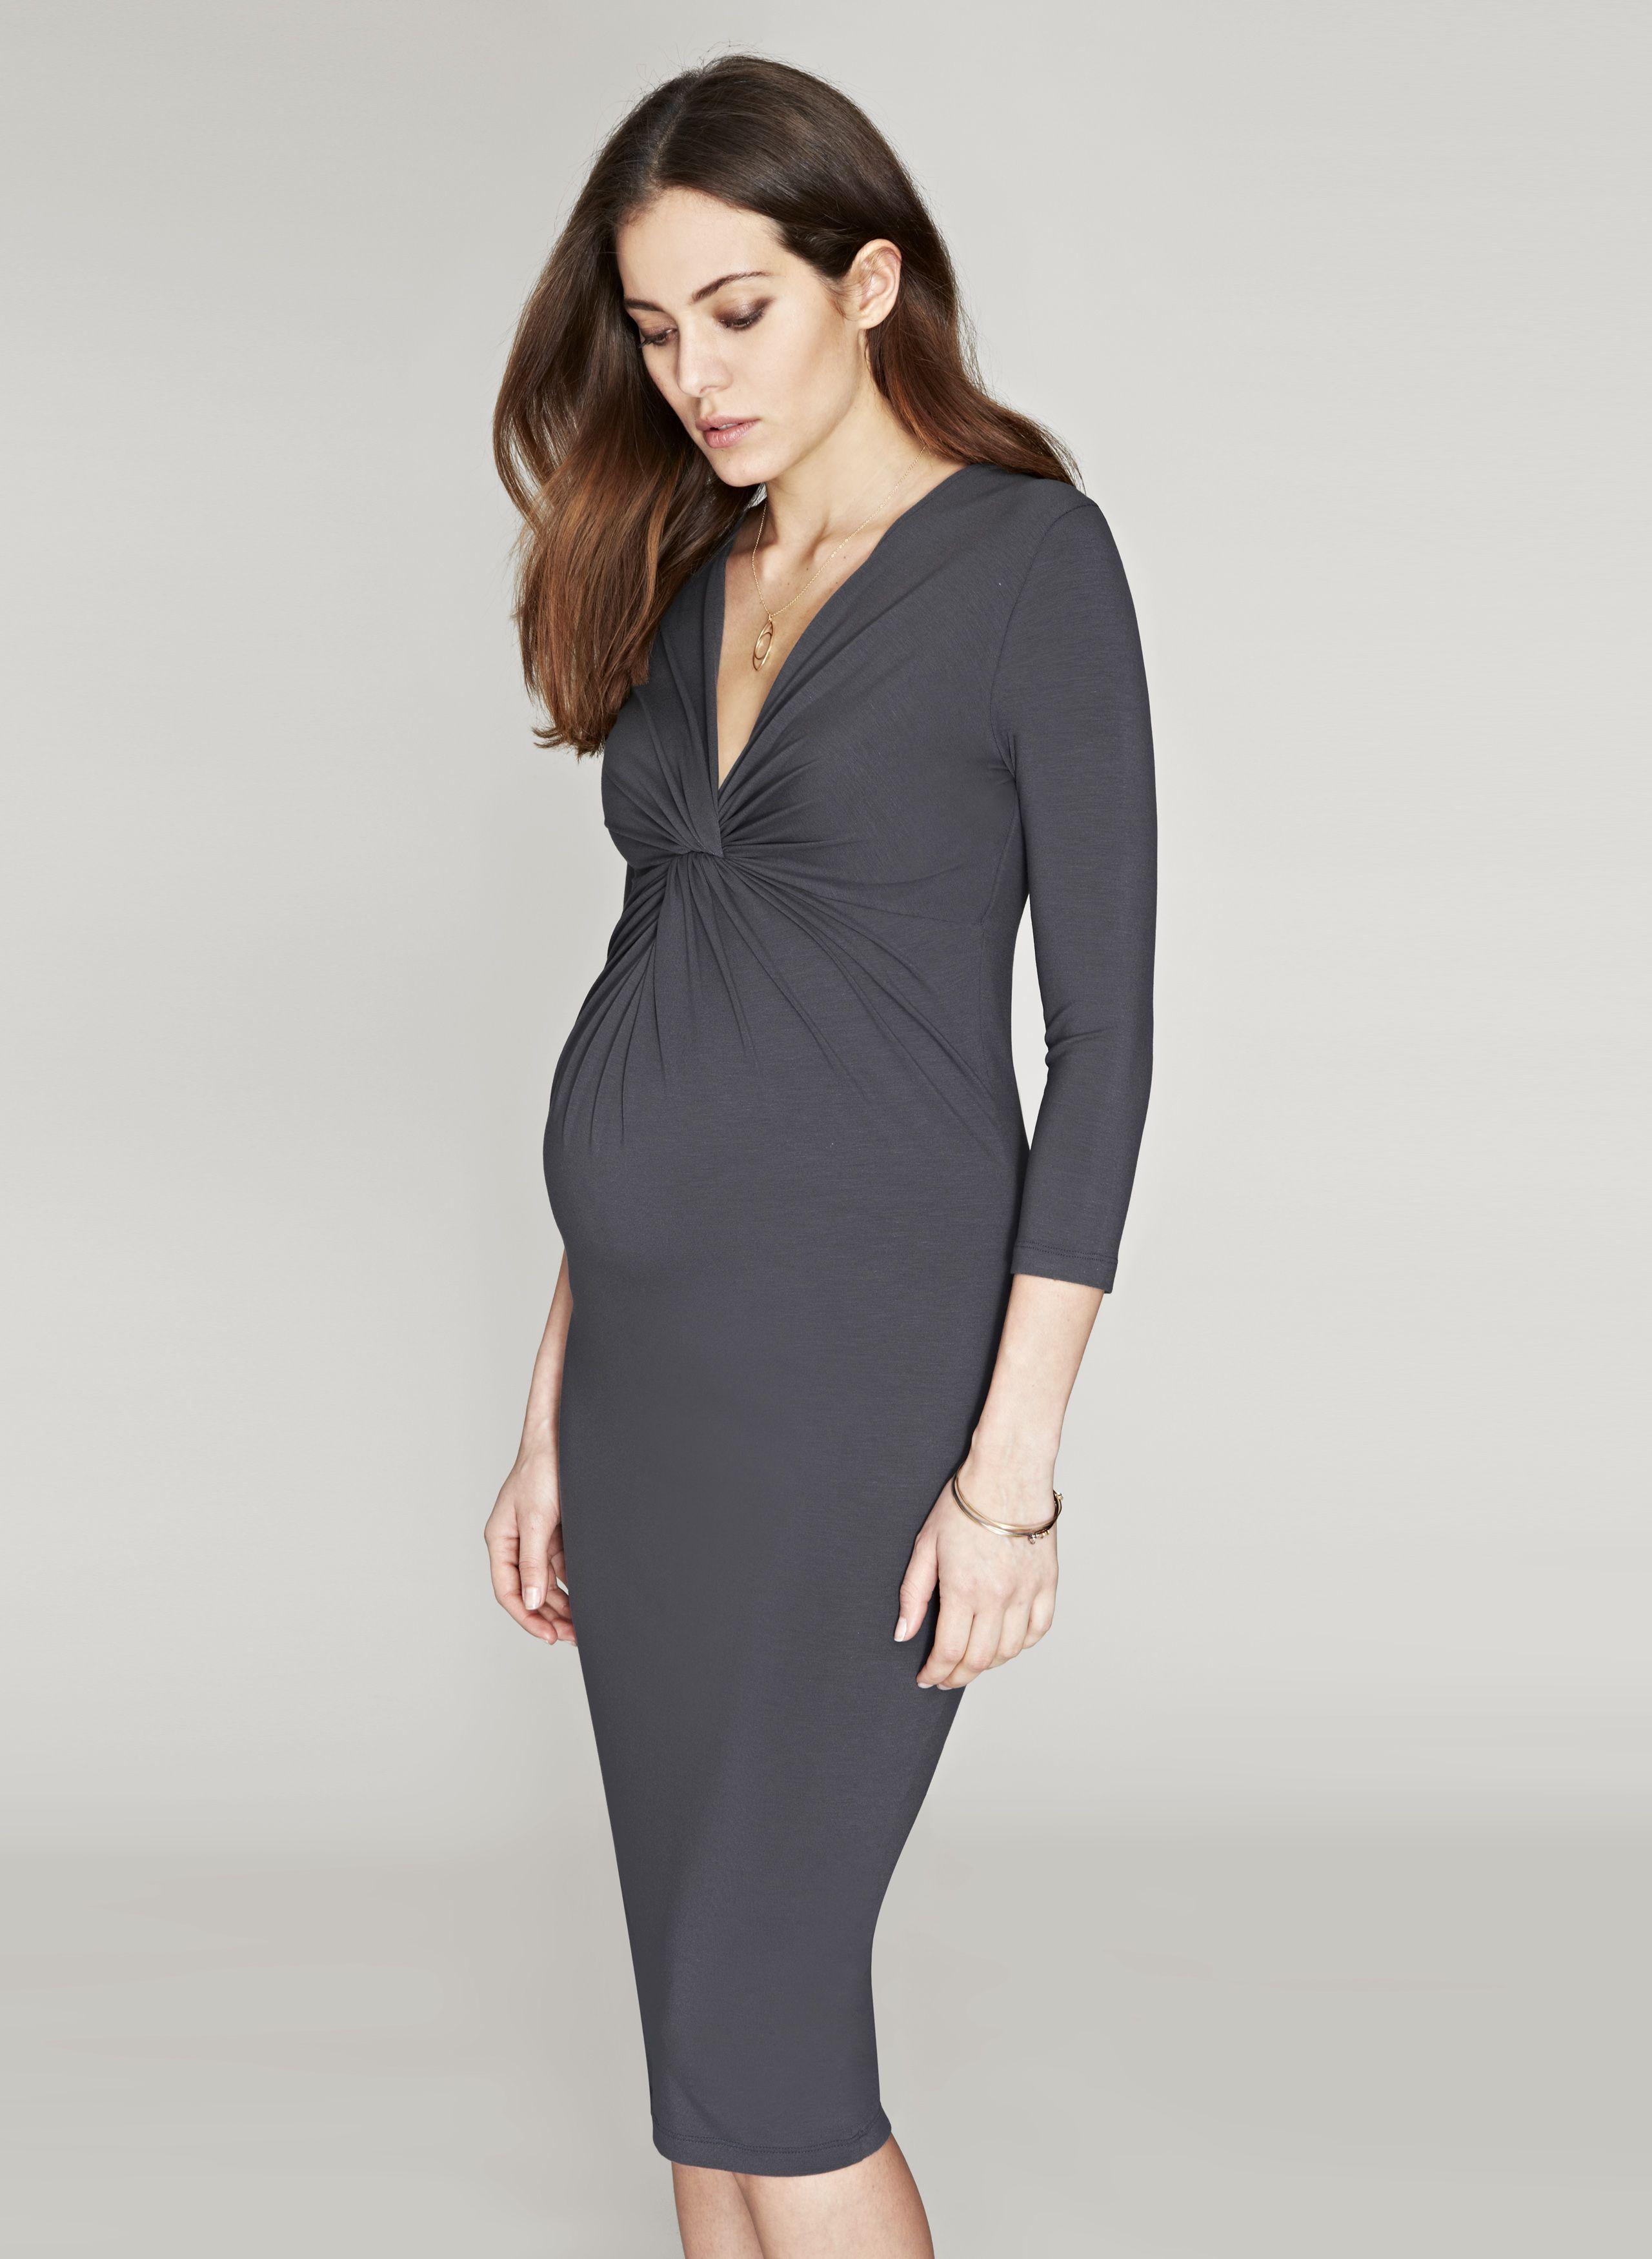 b265702b45e9e Isabella Oliver | Somerton Maternity Dress | great fashion ...